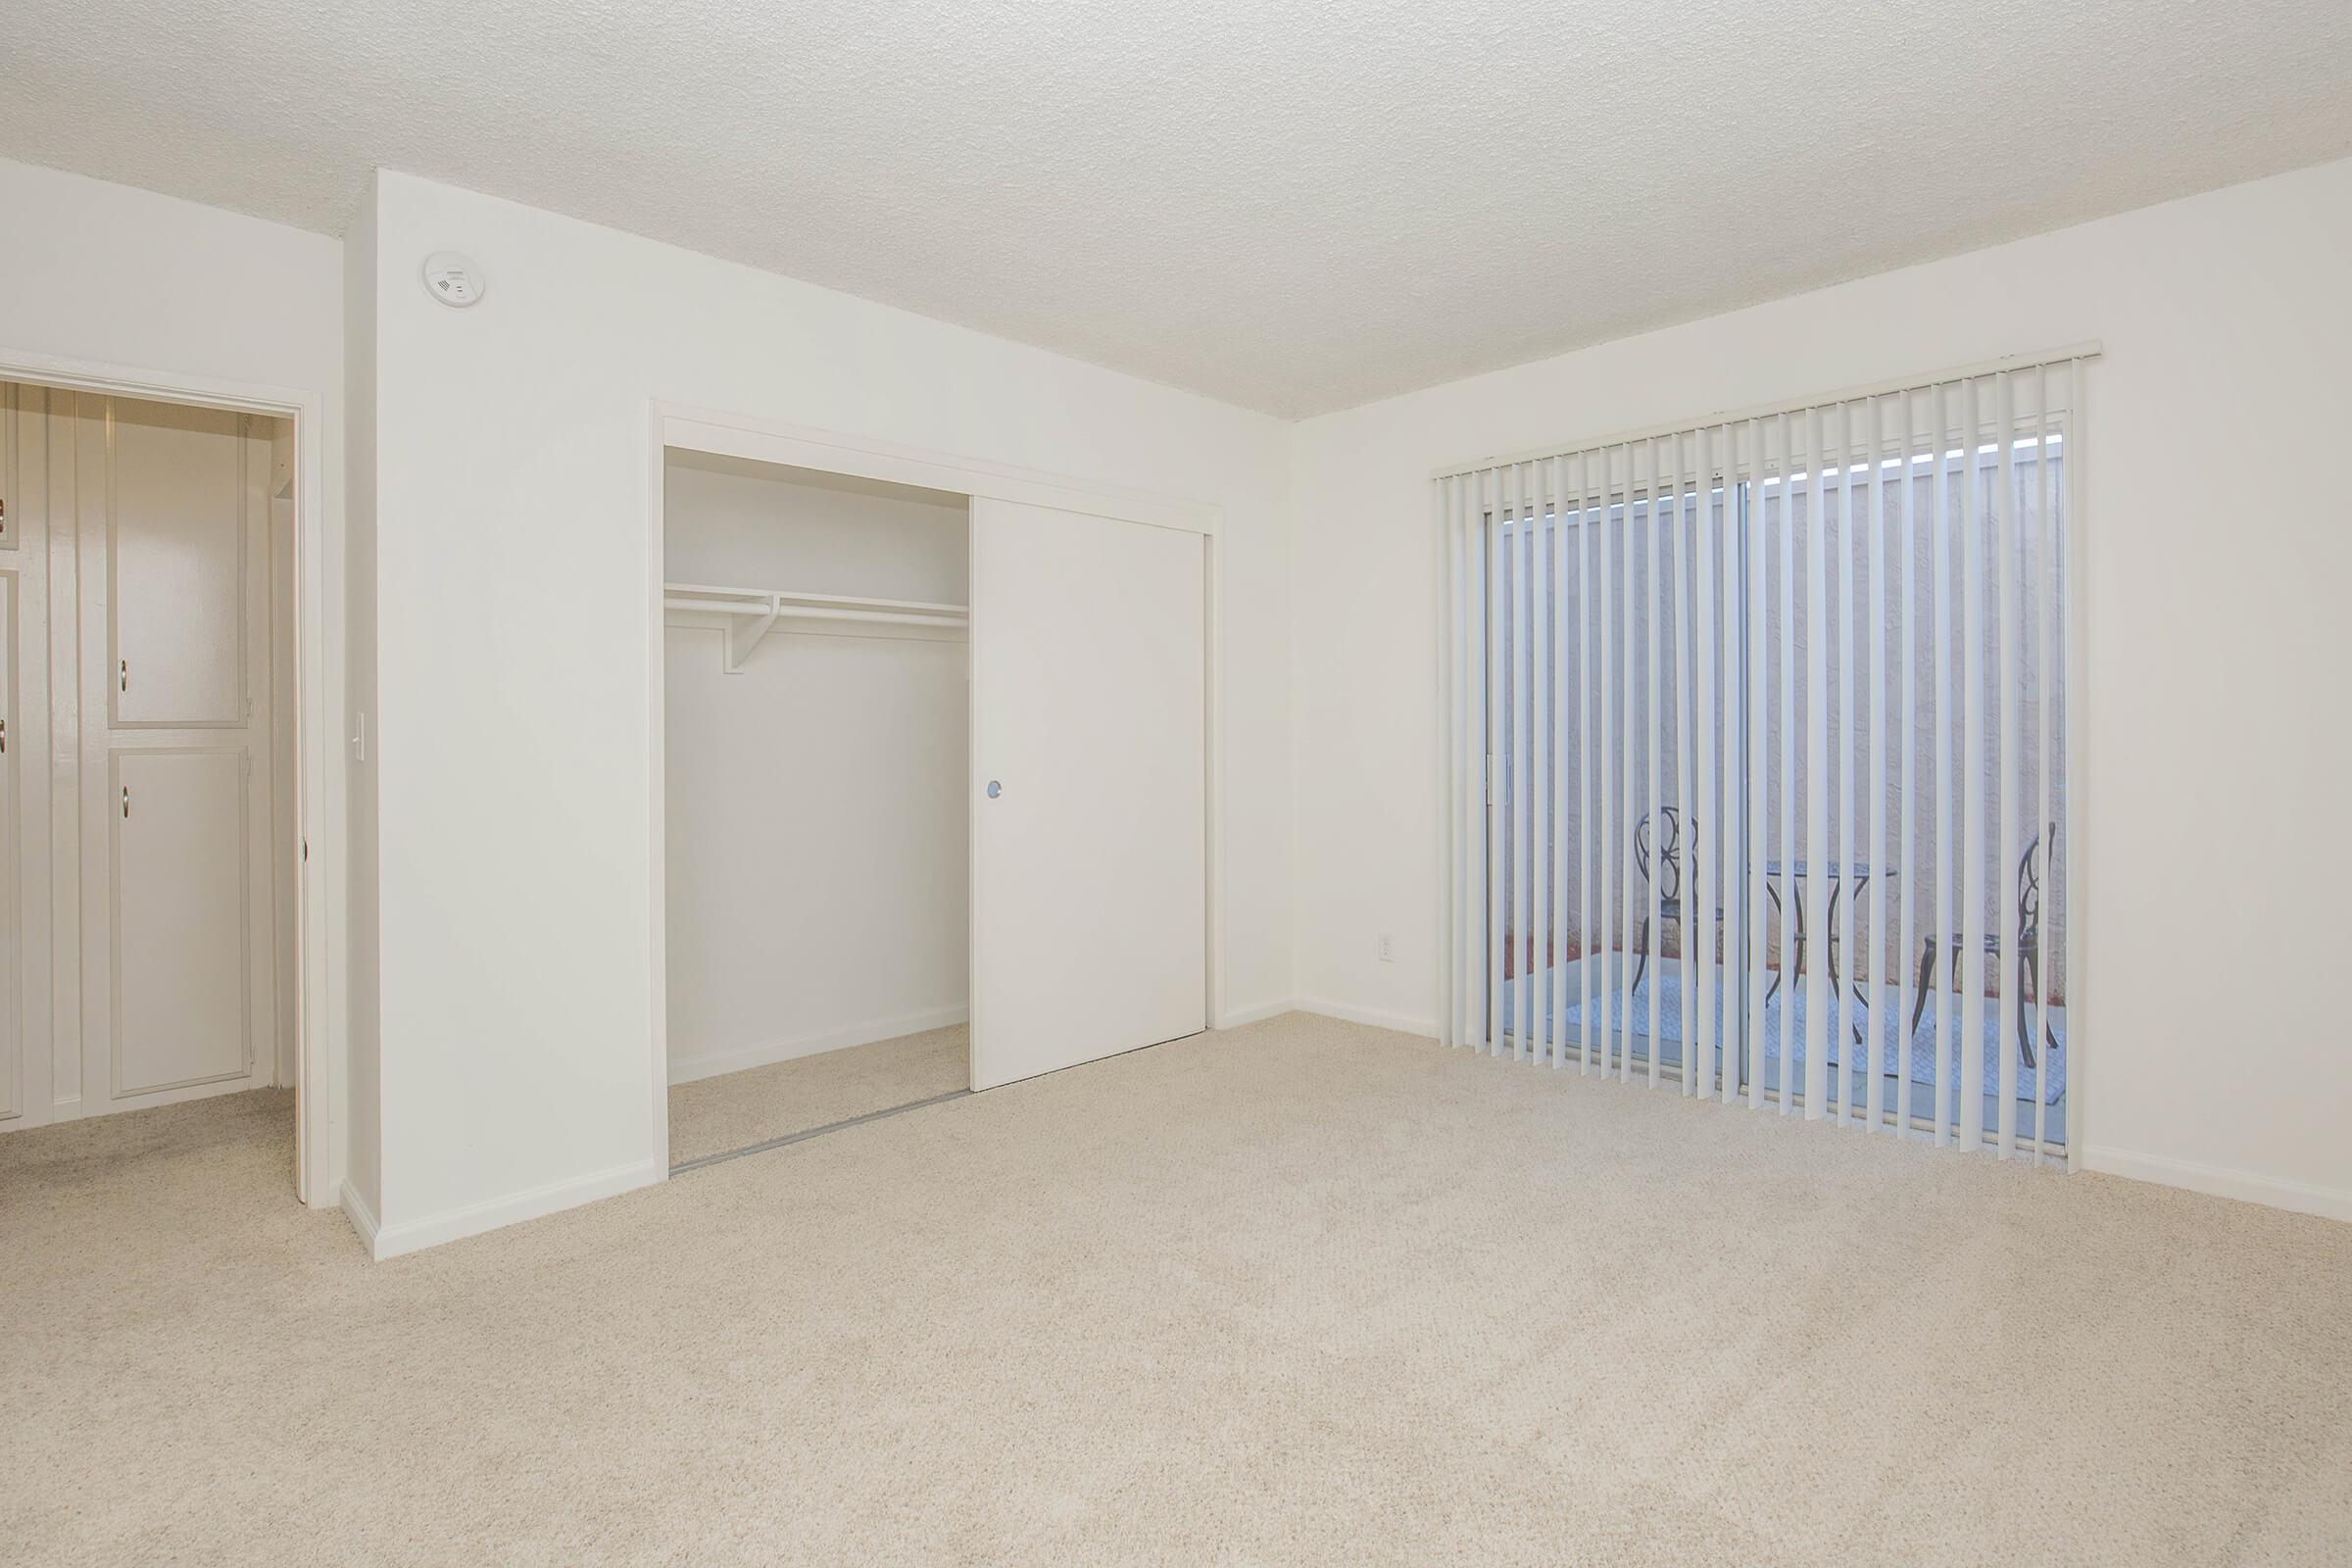 Bedroom with sliding glass doors to patio